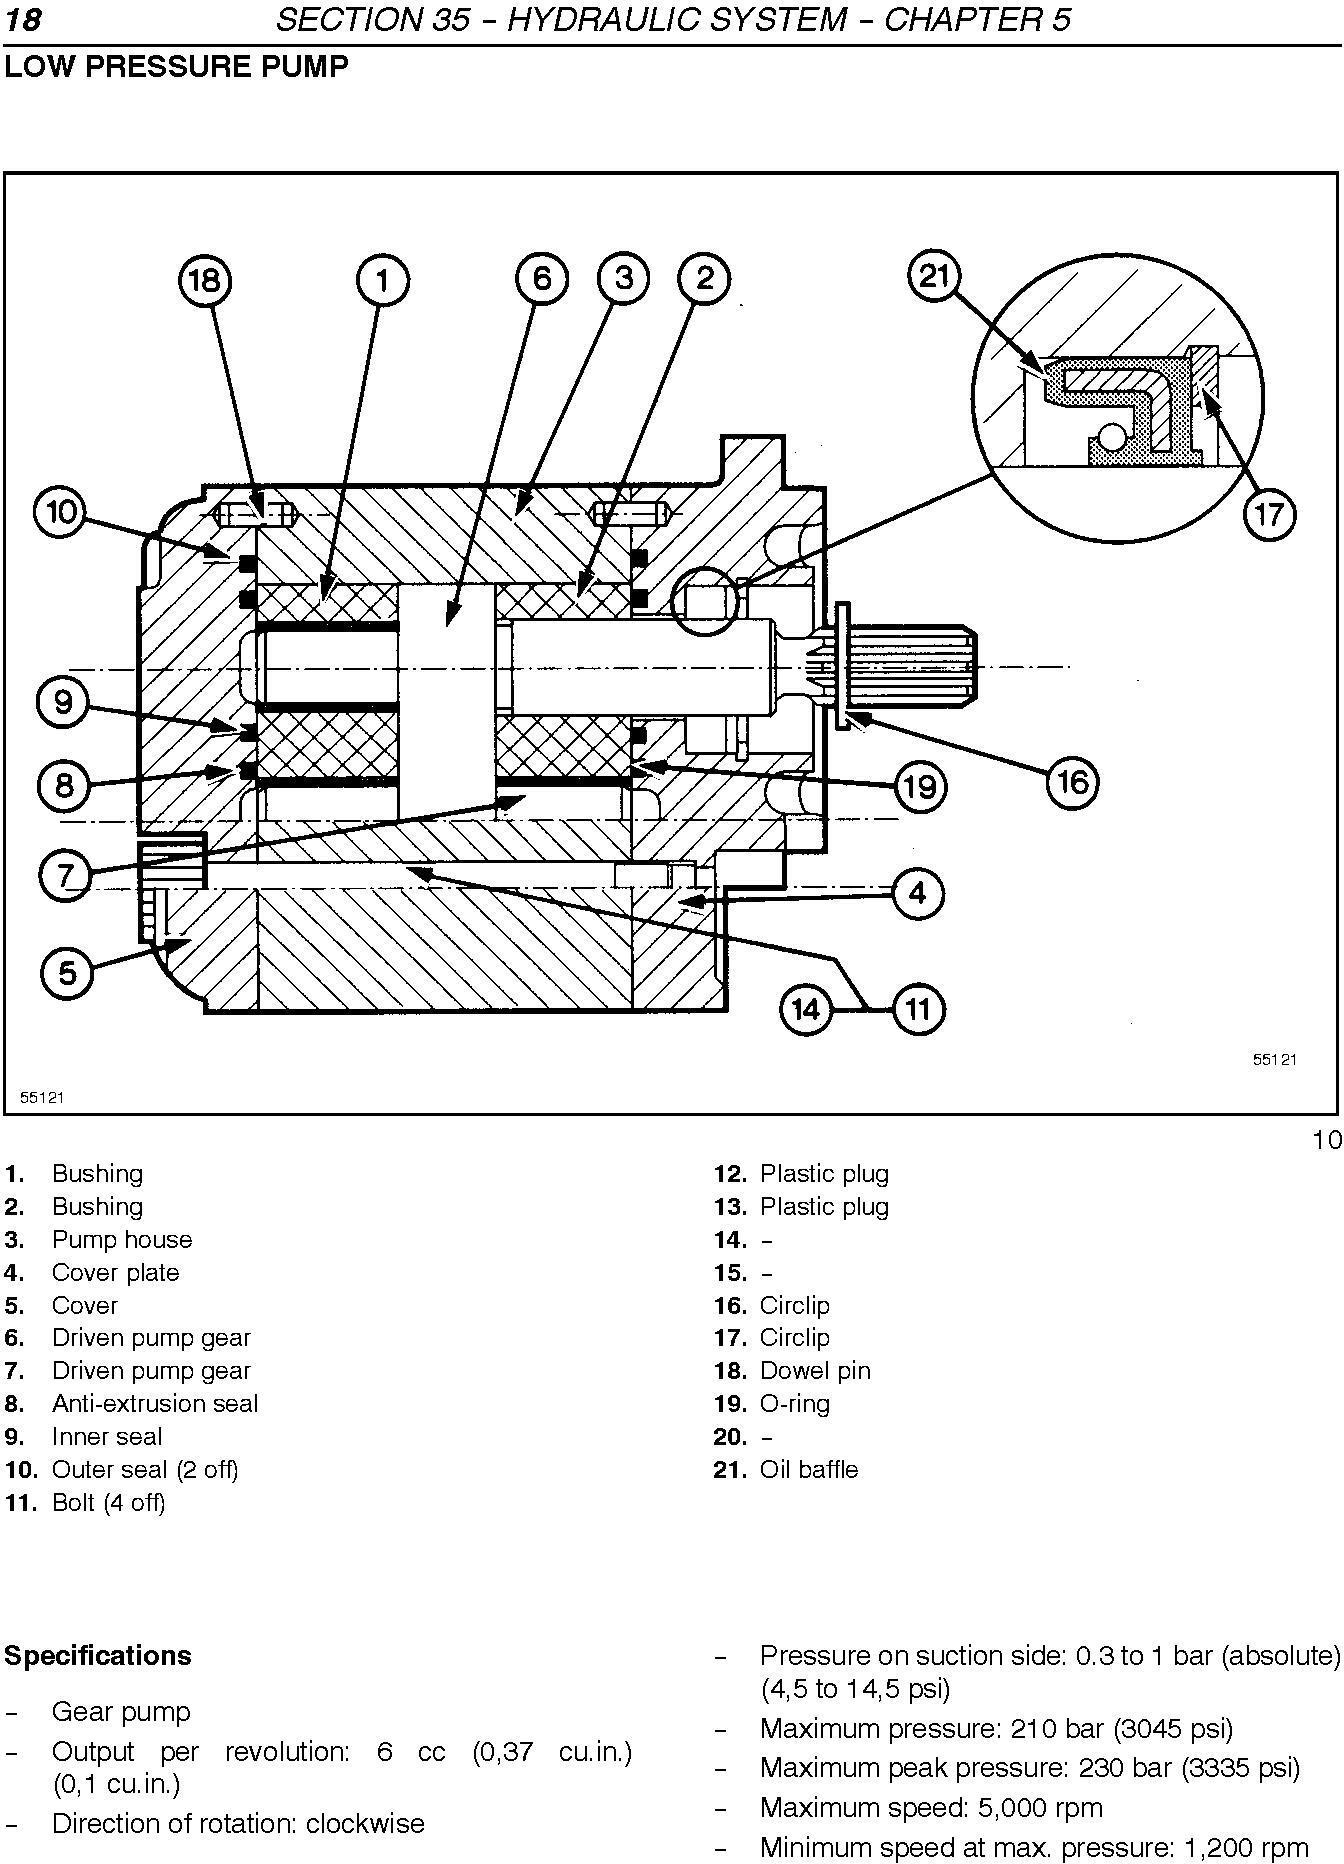 New Holland FX25, FX28, FX38, FX45, FX48, FX58 Forage Harvester Complete Service Manual - 1